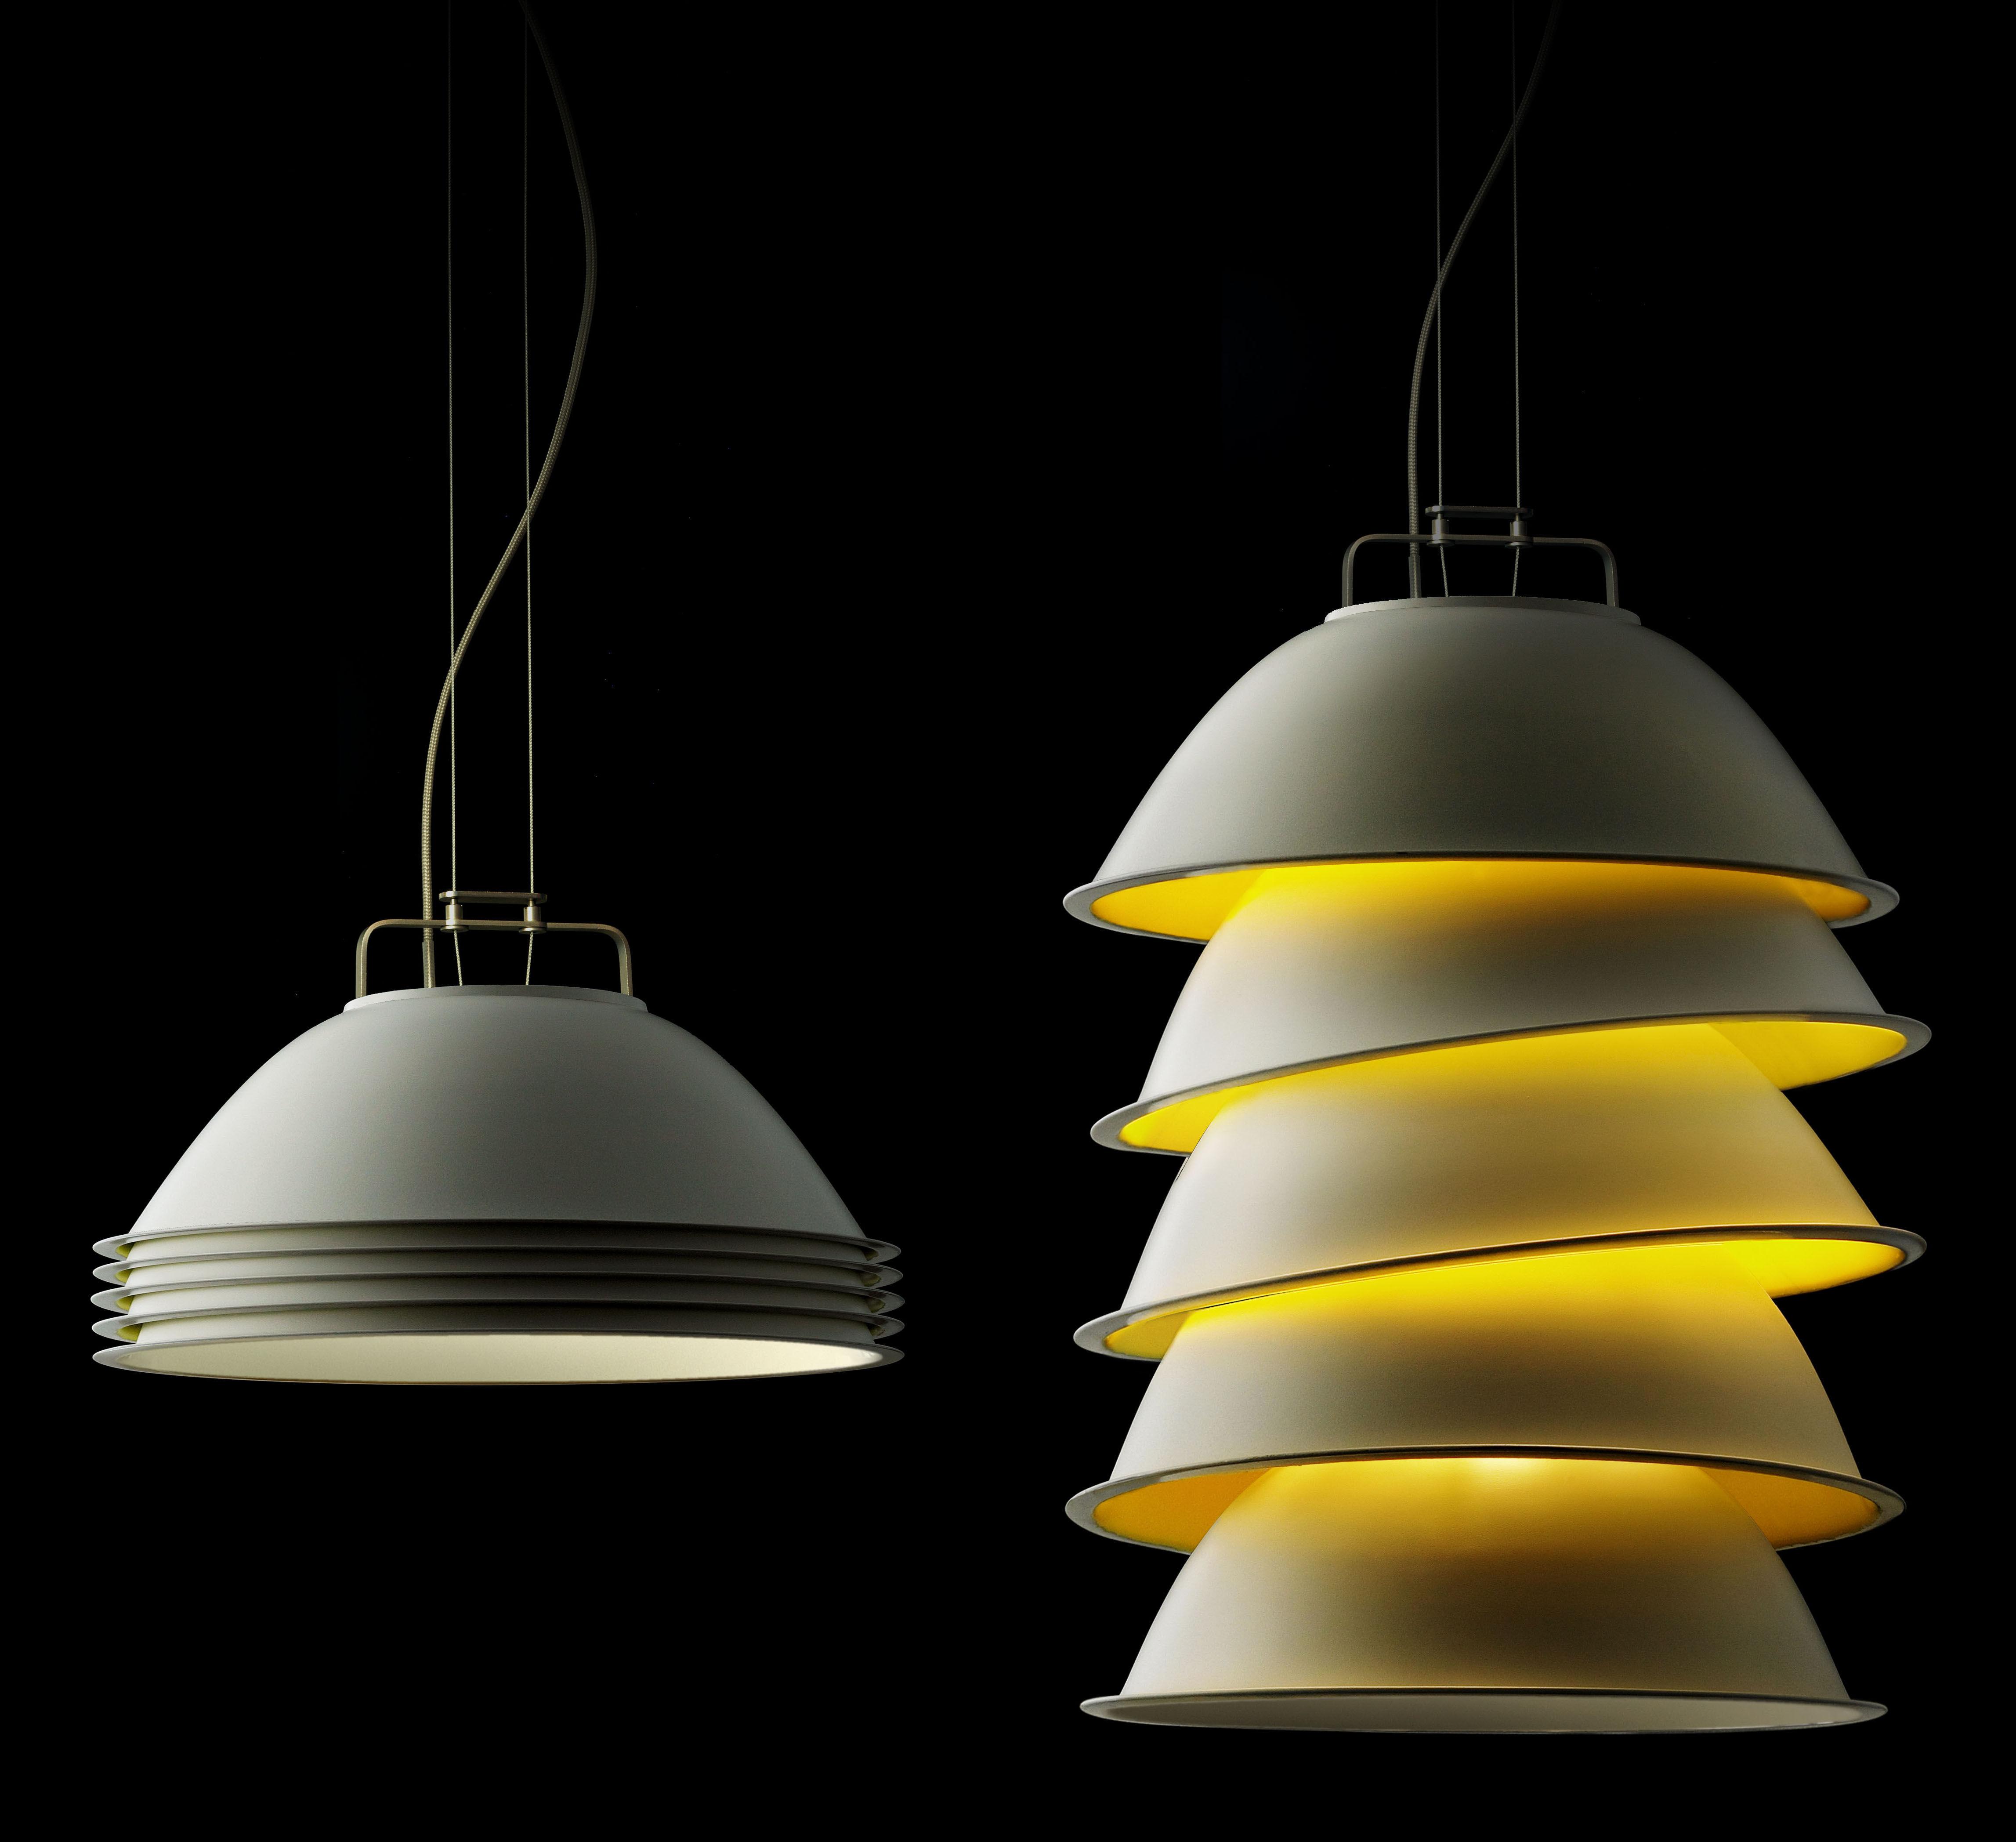 Illuminazione - Lampadari - Sospensione Five Pack di Ingo Maurer - Bianco - Giallo - Acciaio